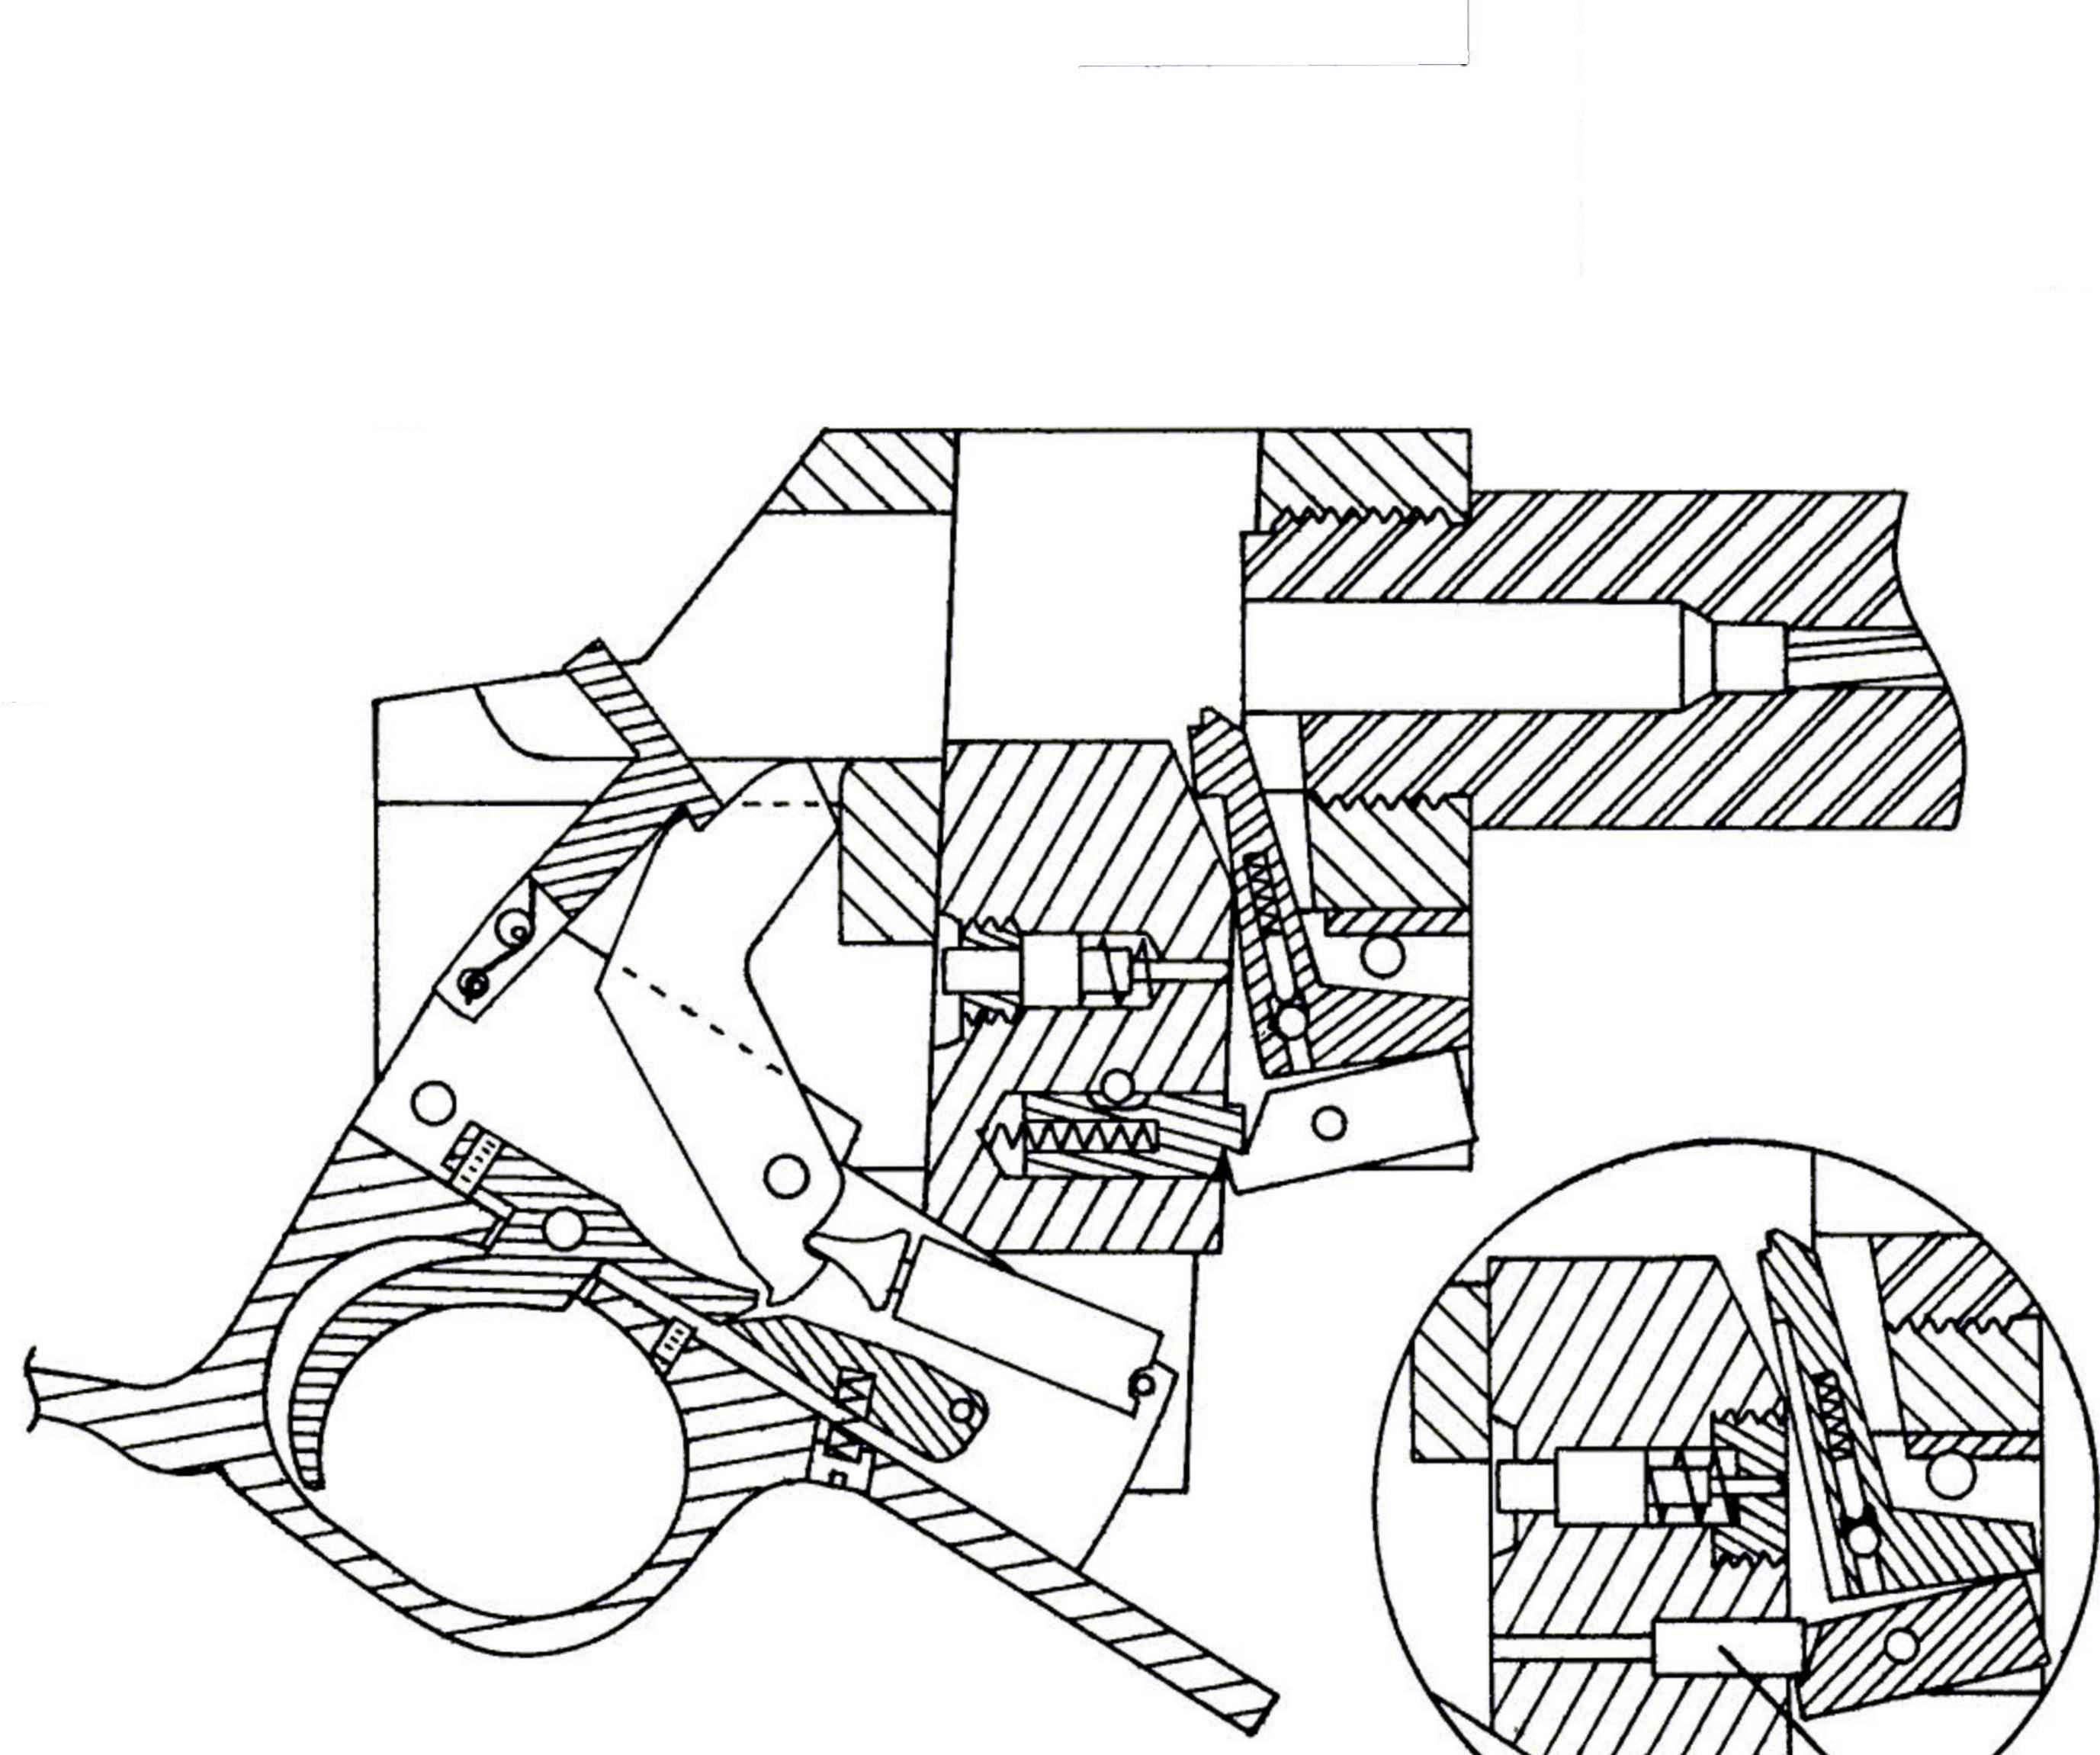 Falling Block Rifle Plans